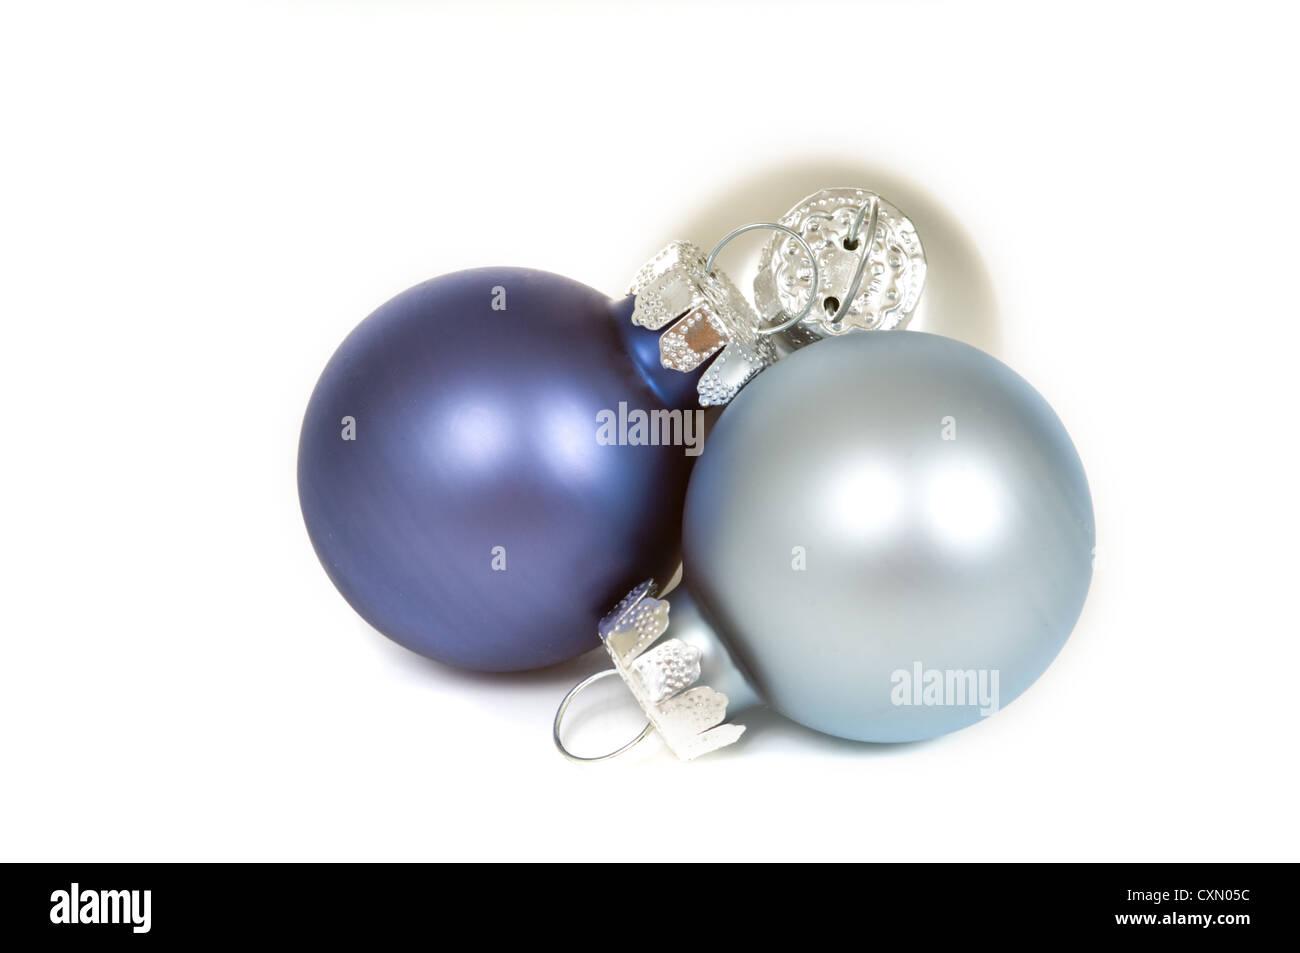 blue silver and white christmas balls on white background stock image - White Christmas Balls